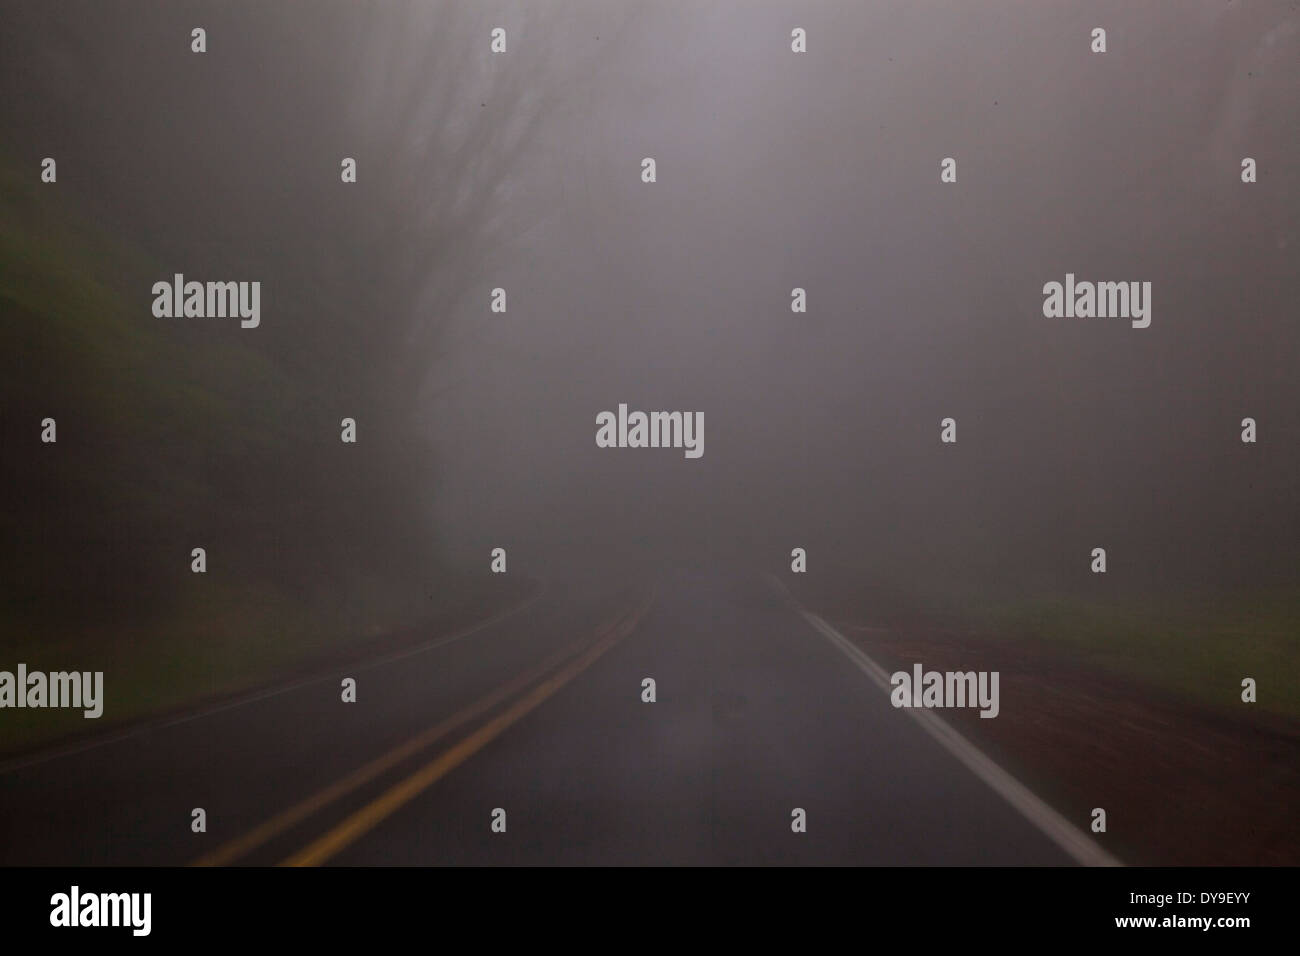 Un oscuro, lluvioso, foggy road, cerca de Cabo Lookout, Costa de Oregón, Estados Unidos Imagen De Stock